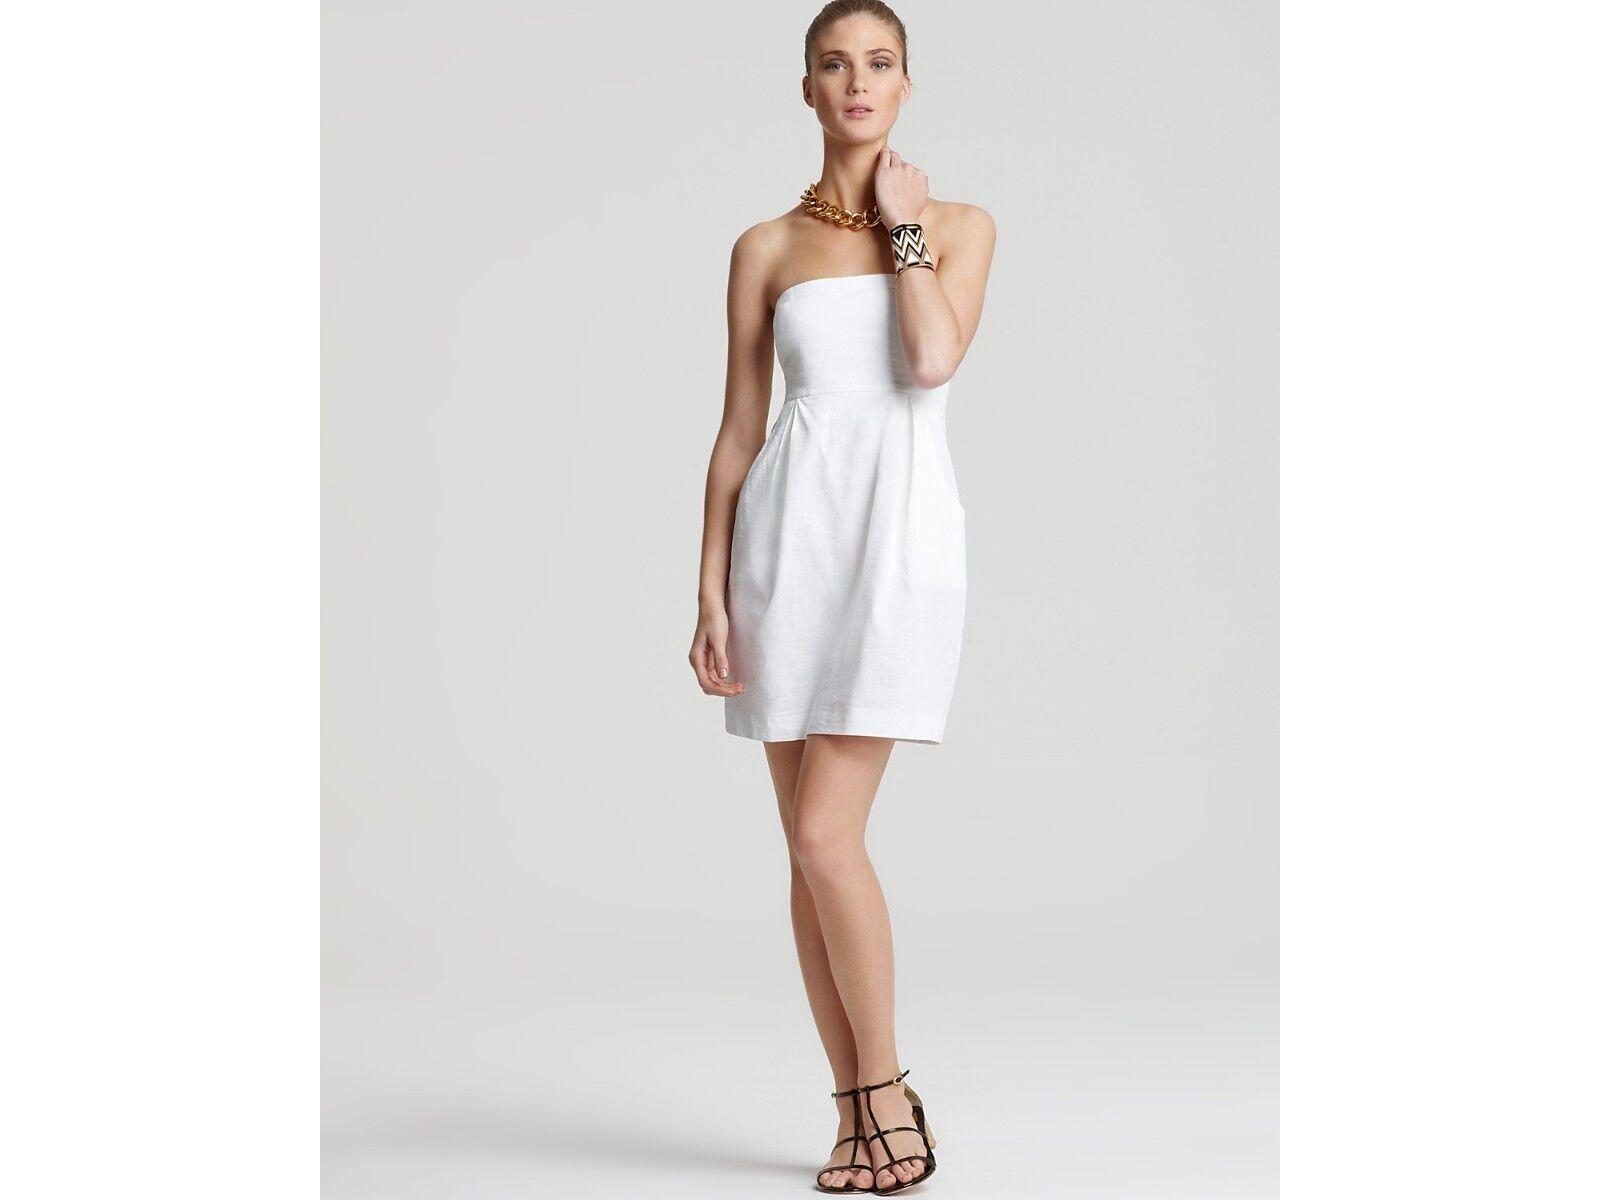 275 Theory Tyrah Crunch Stretch White Strapless Dress 10